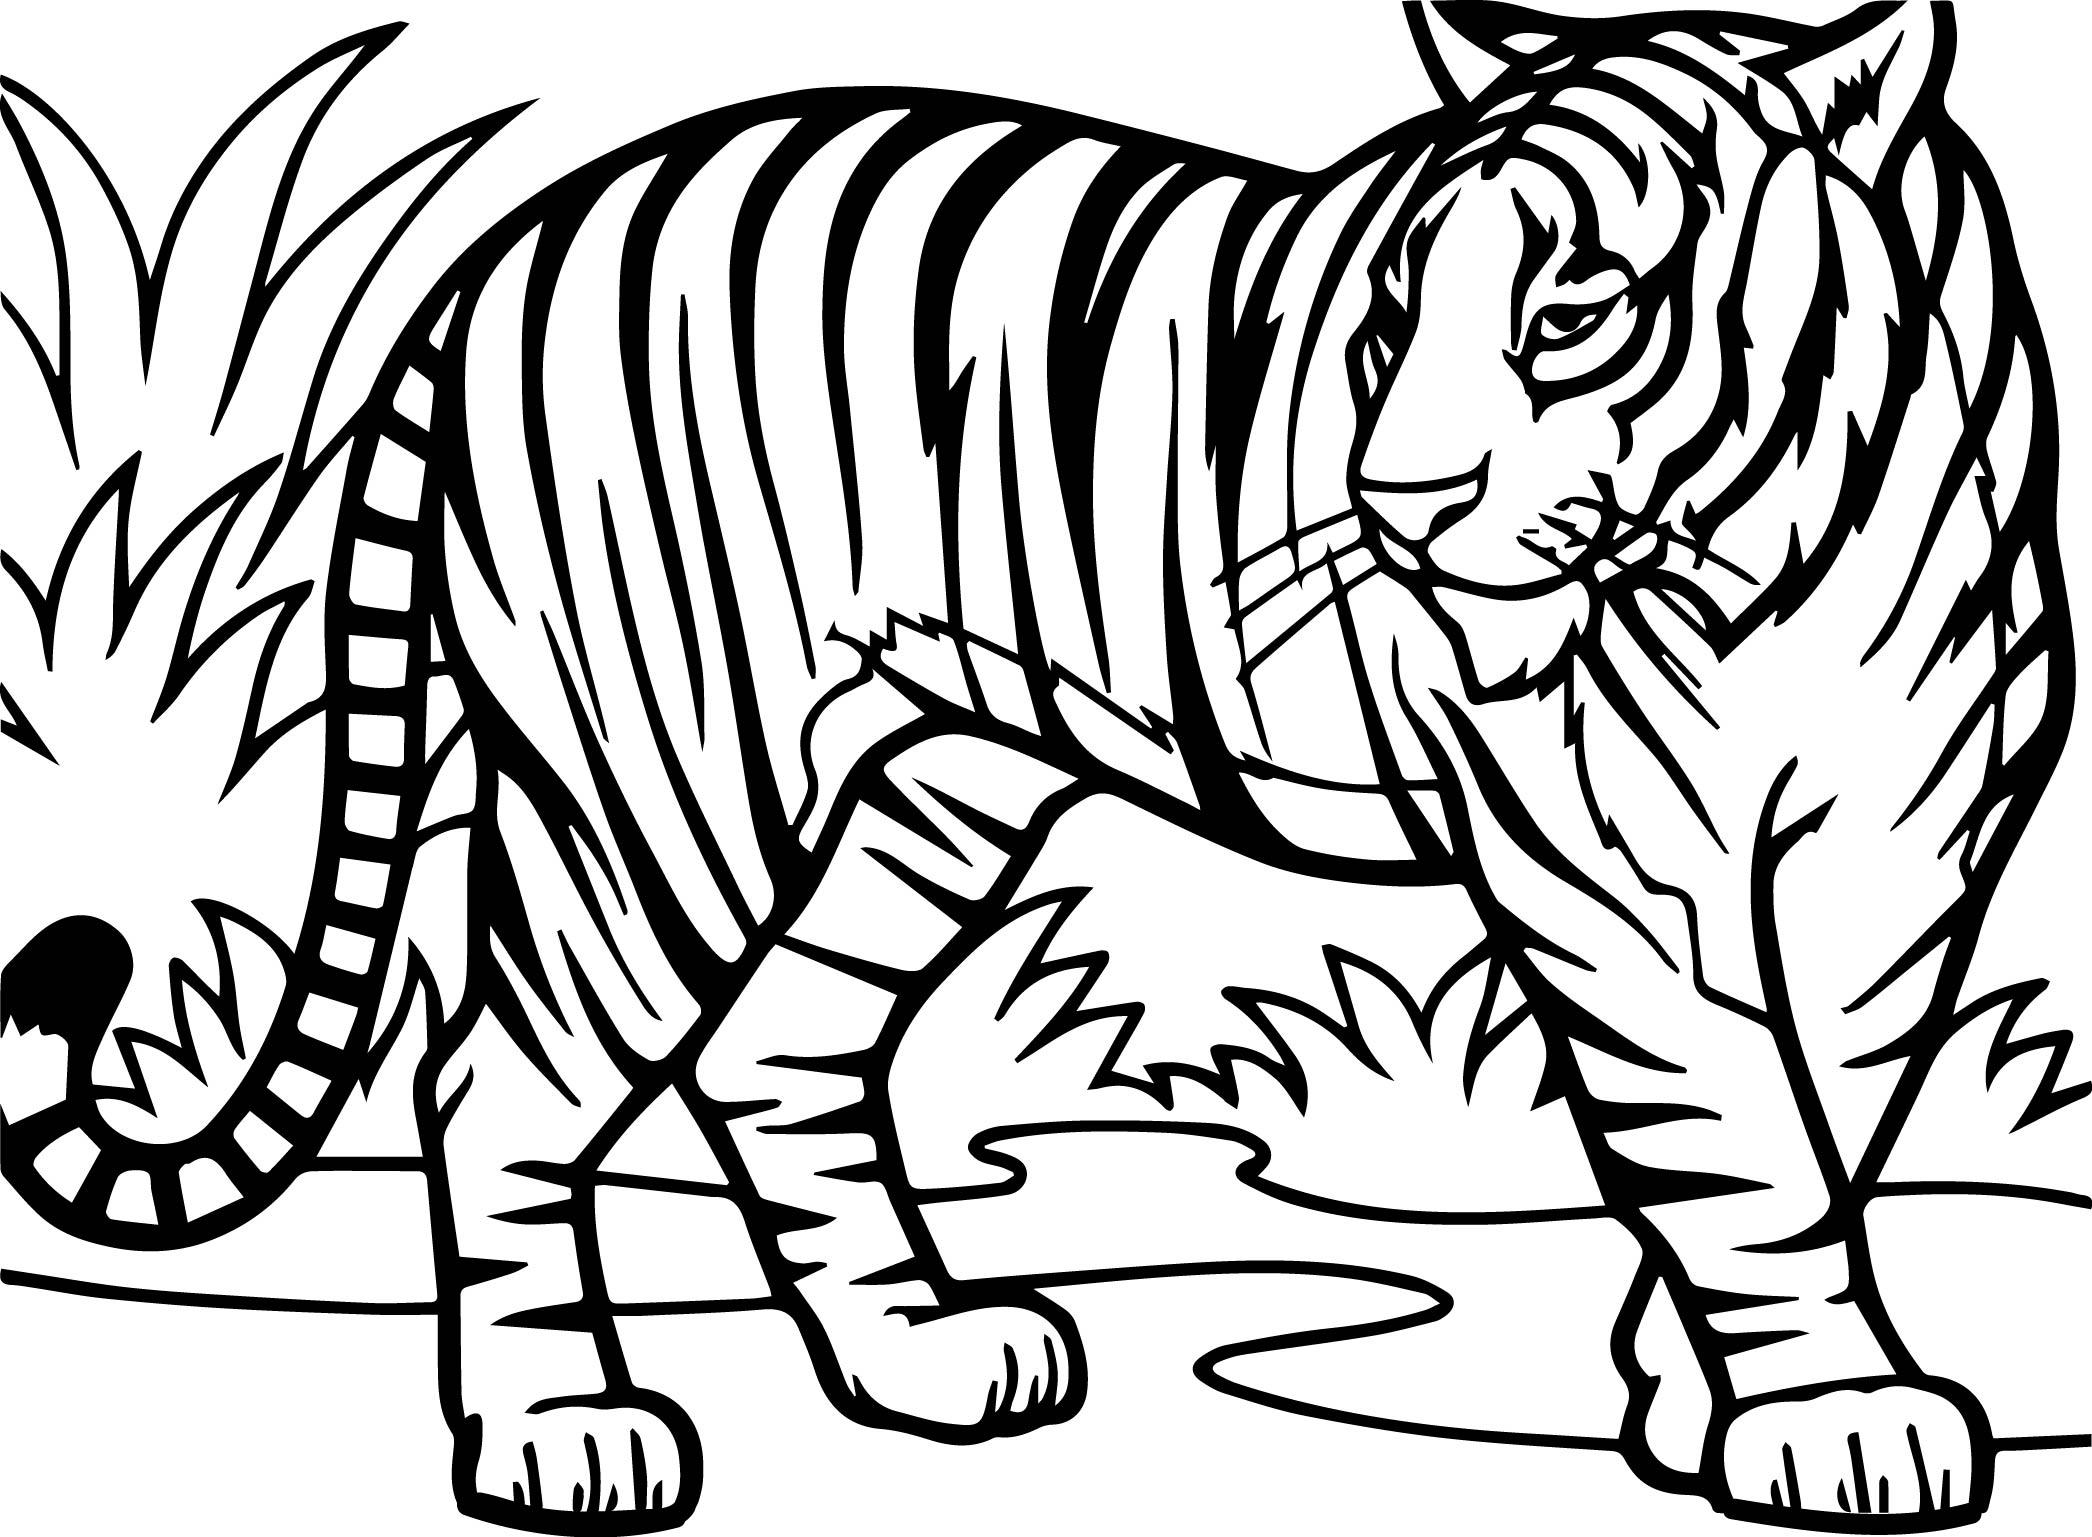 2092x1537 Fresh Tiger Coloring Page Design Printable Coloring Sheet